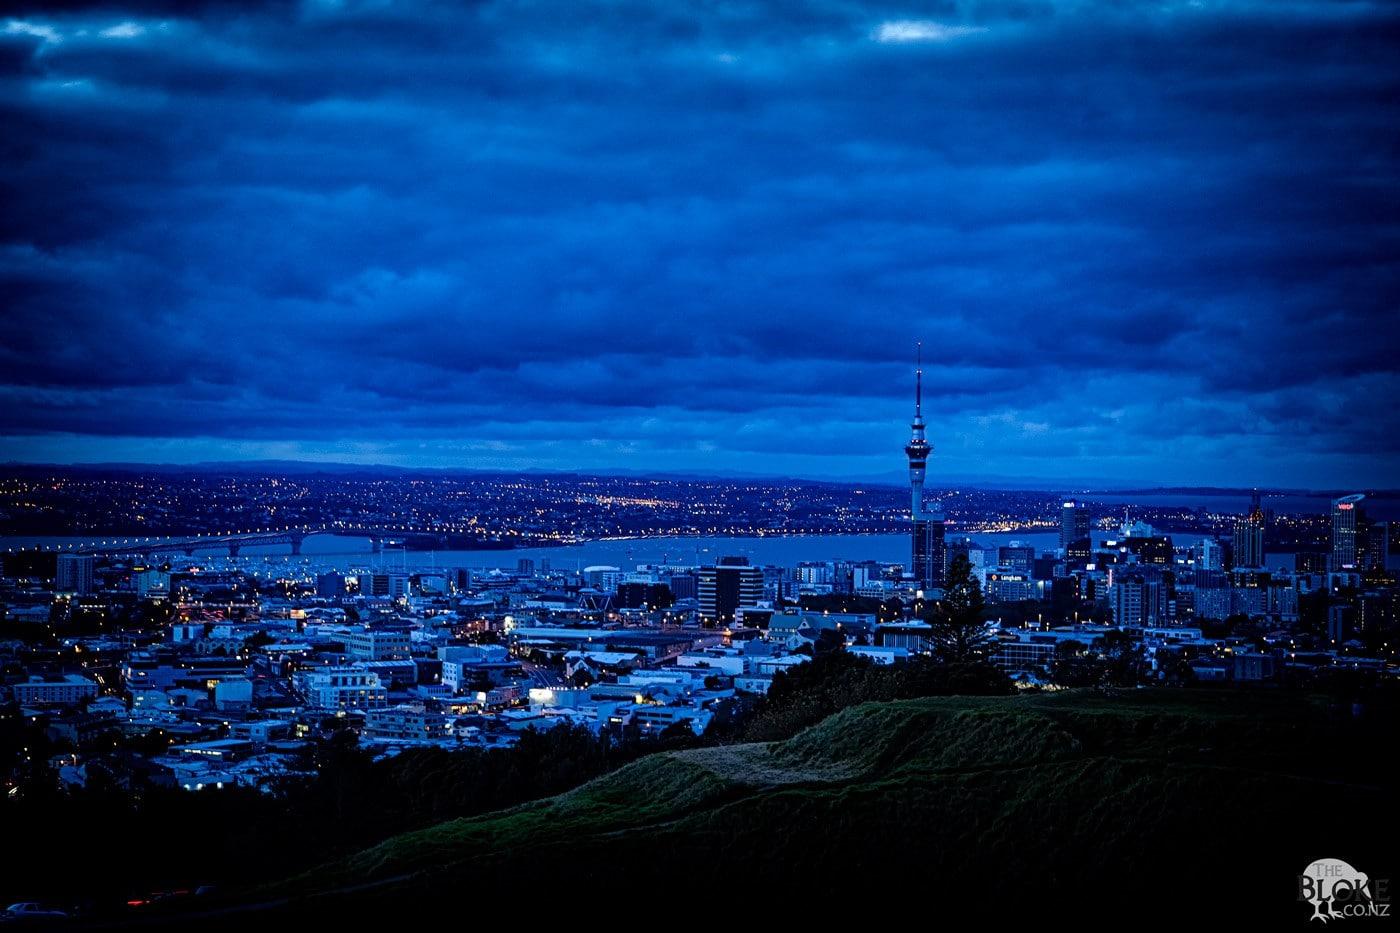 twilight hunting, Twilight Hunting – understanding light